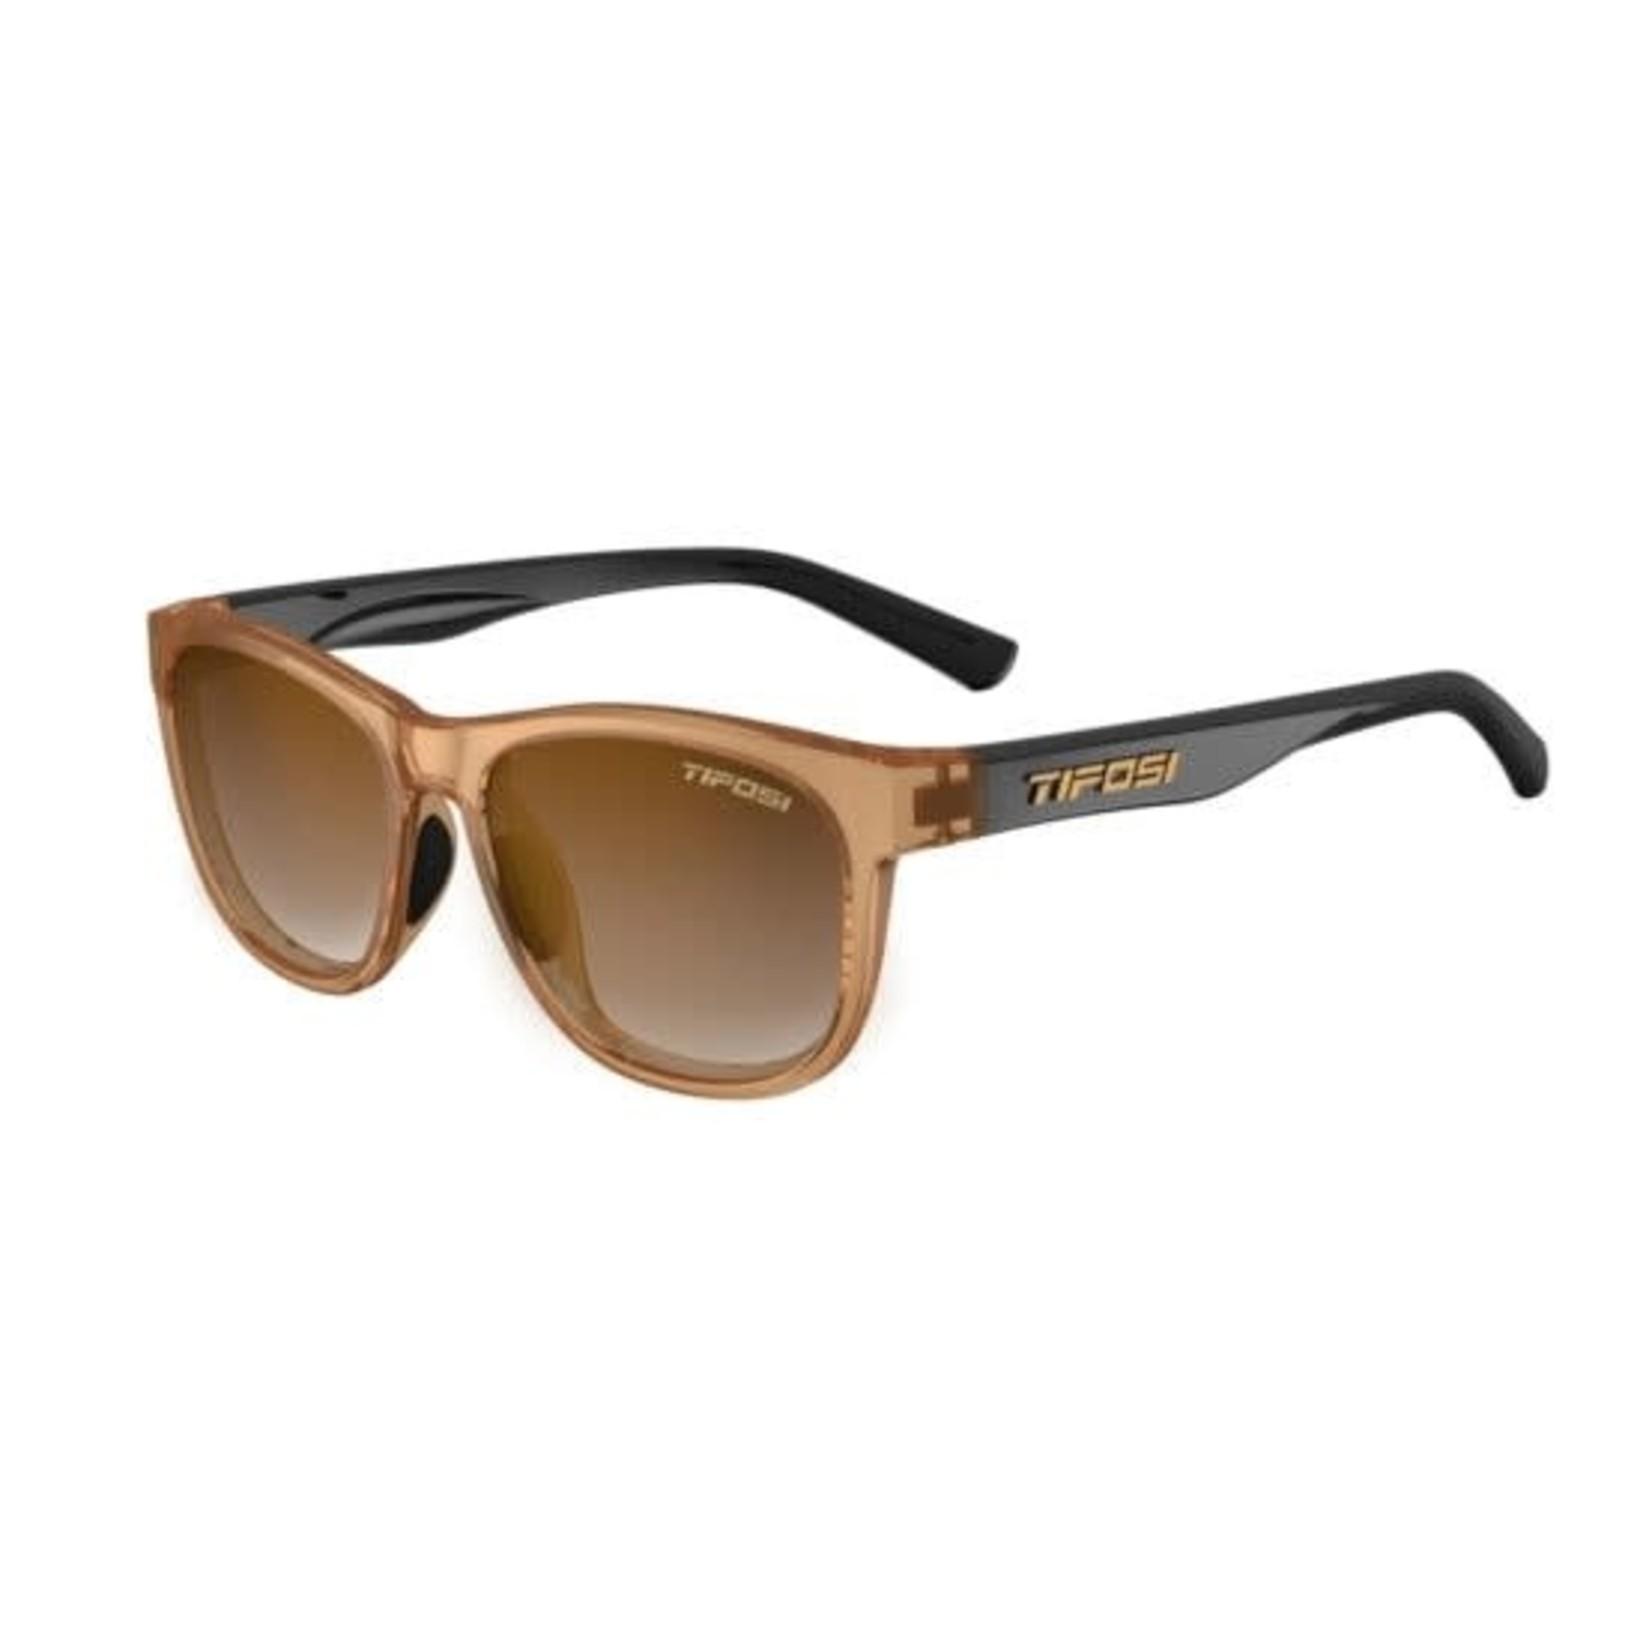 Tifosi Optics Swank, Crystal Brown/Onyx Single Lens Sunglasses